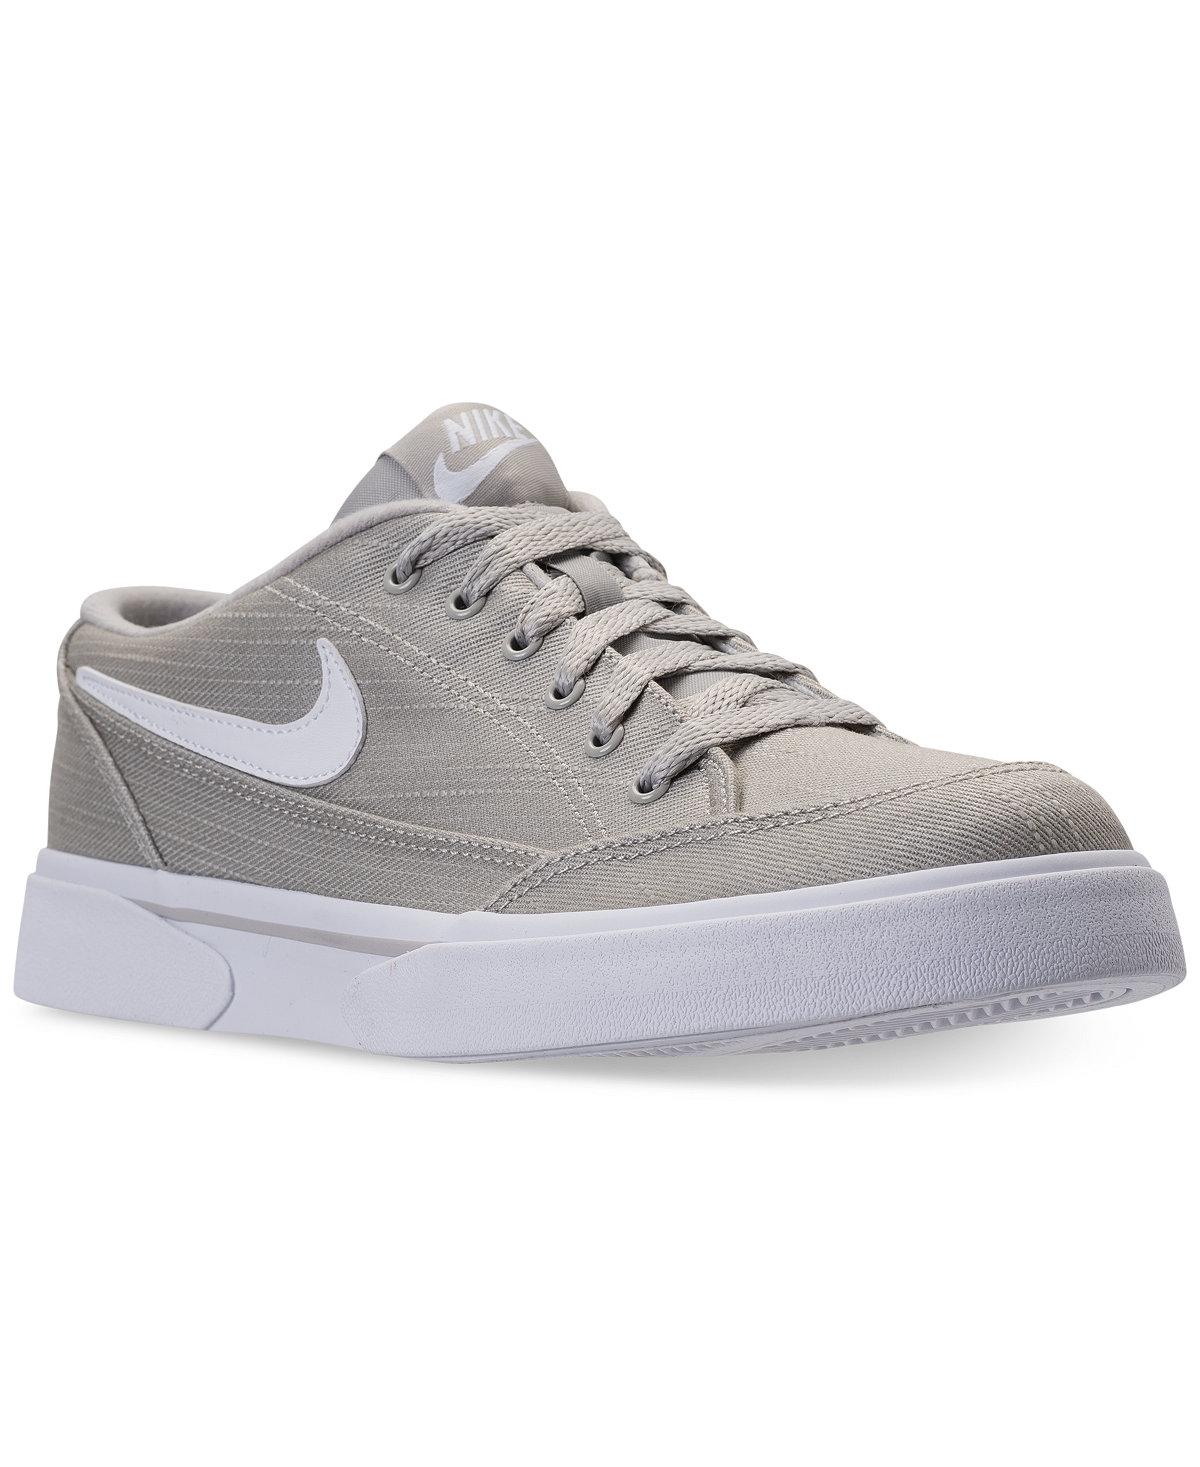 Nike Men's GTS 2016 TXT sneakers ($39.98)